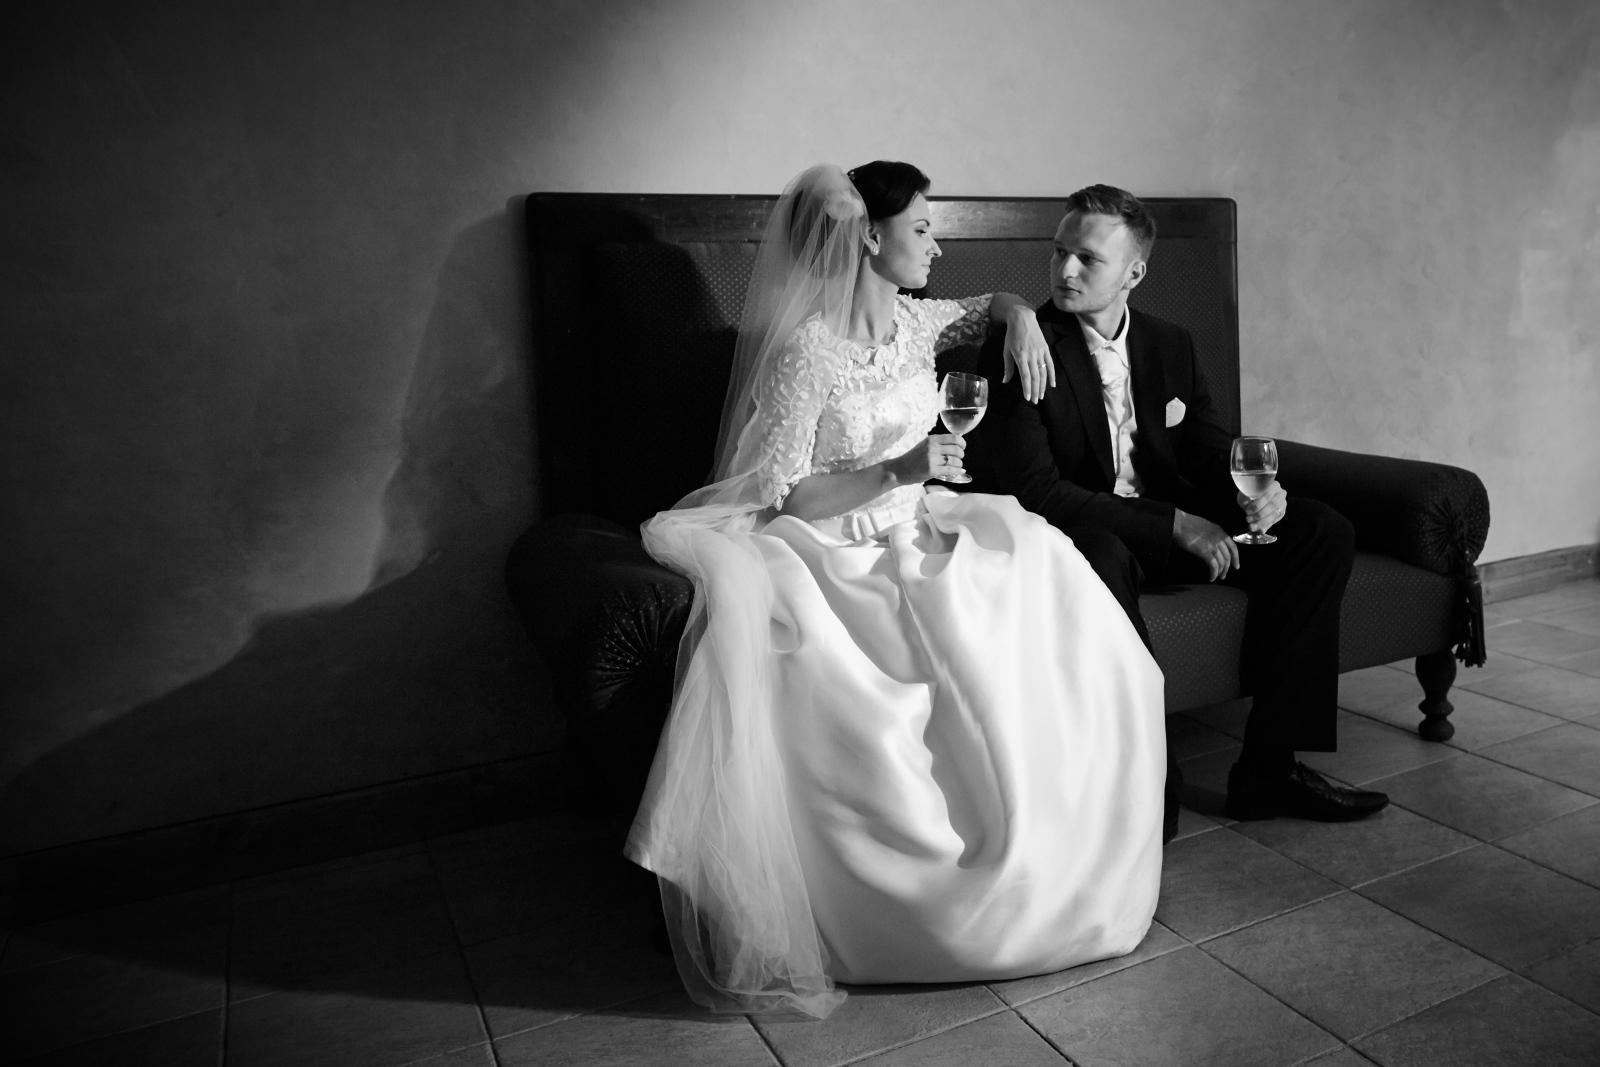 Svadba M+M - Obrázok č. 14